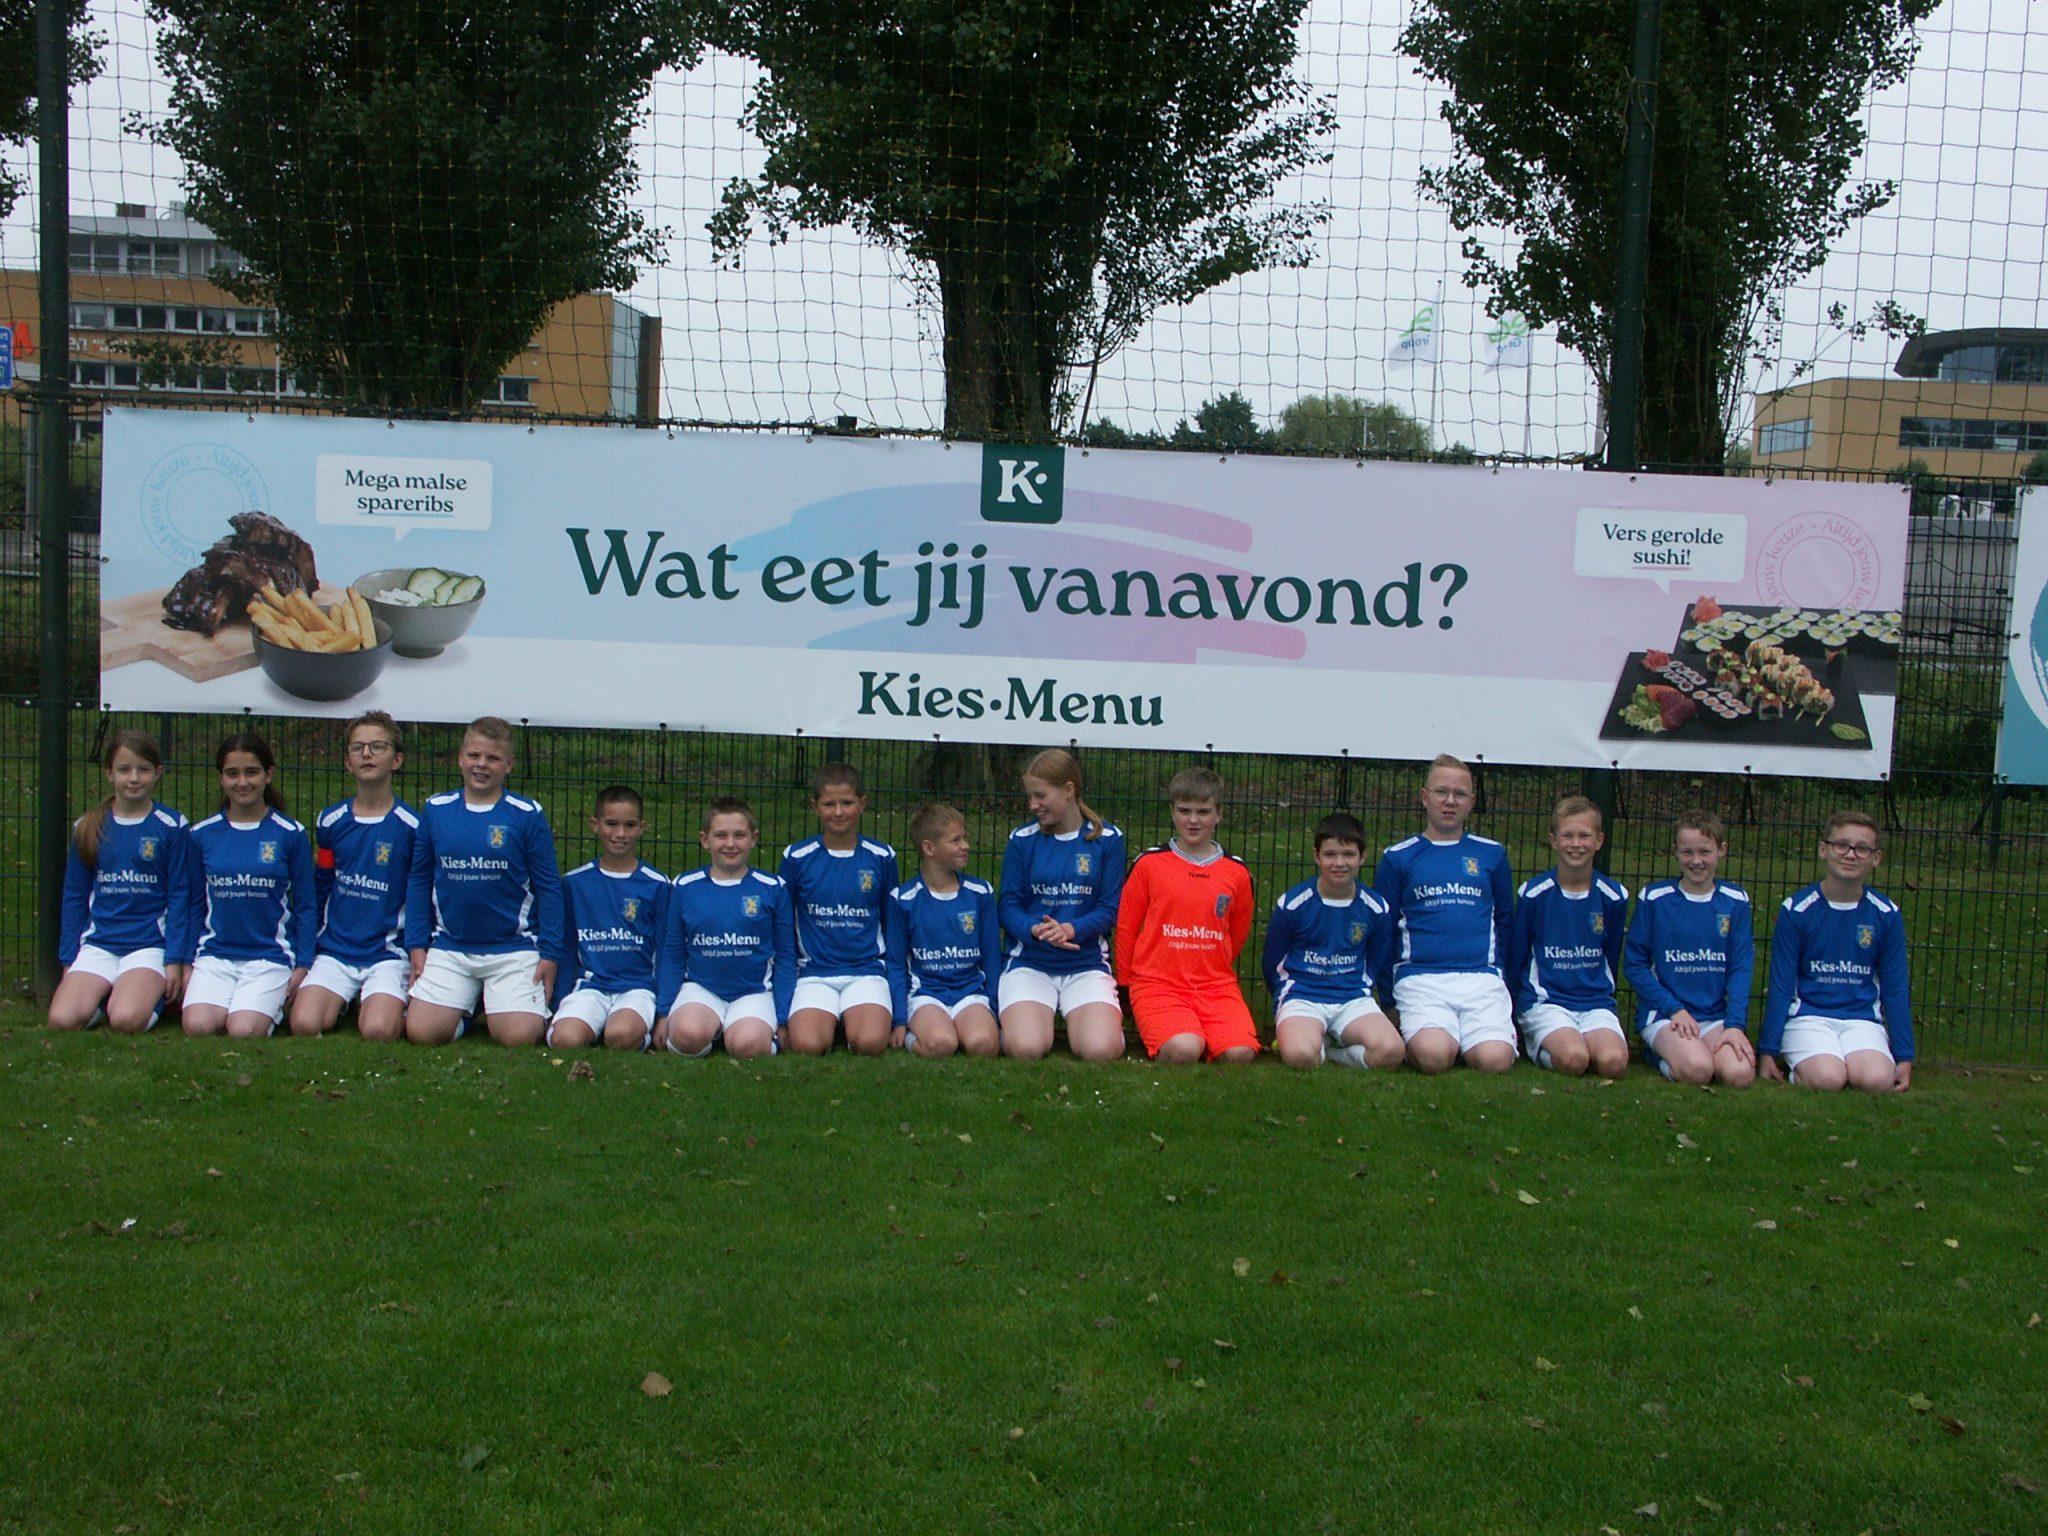 Kies-menu.nl